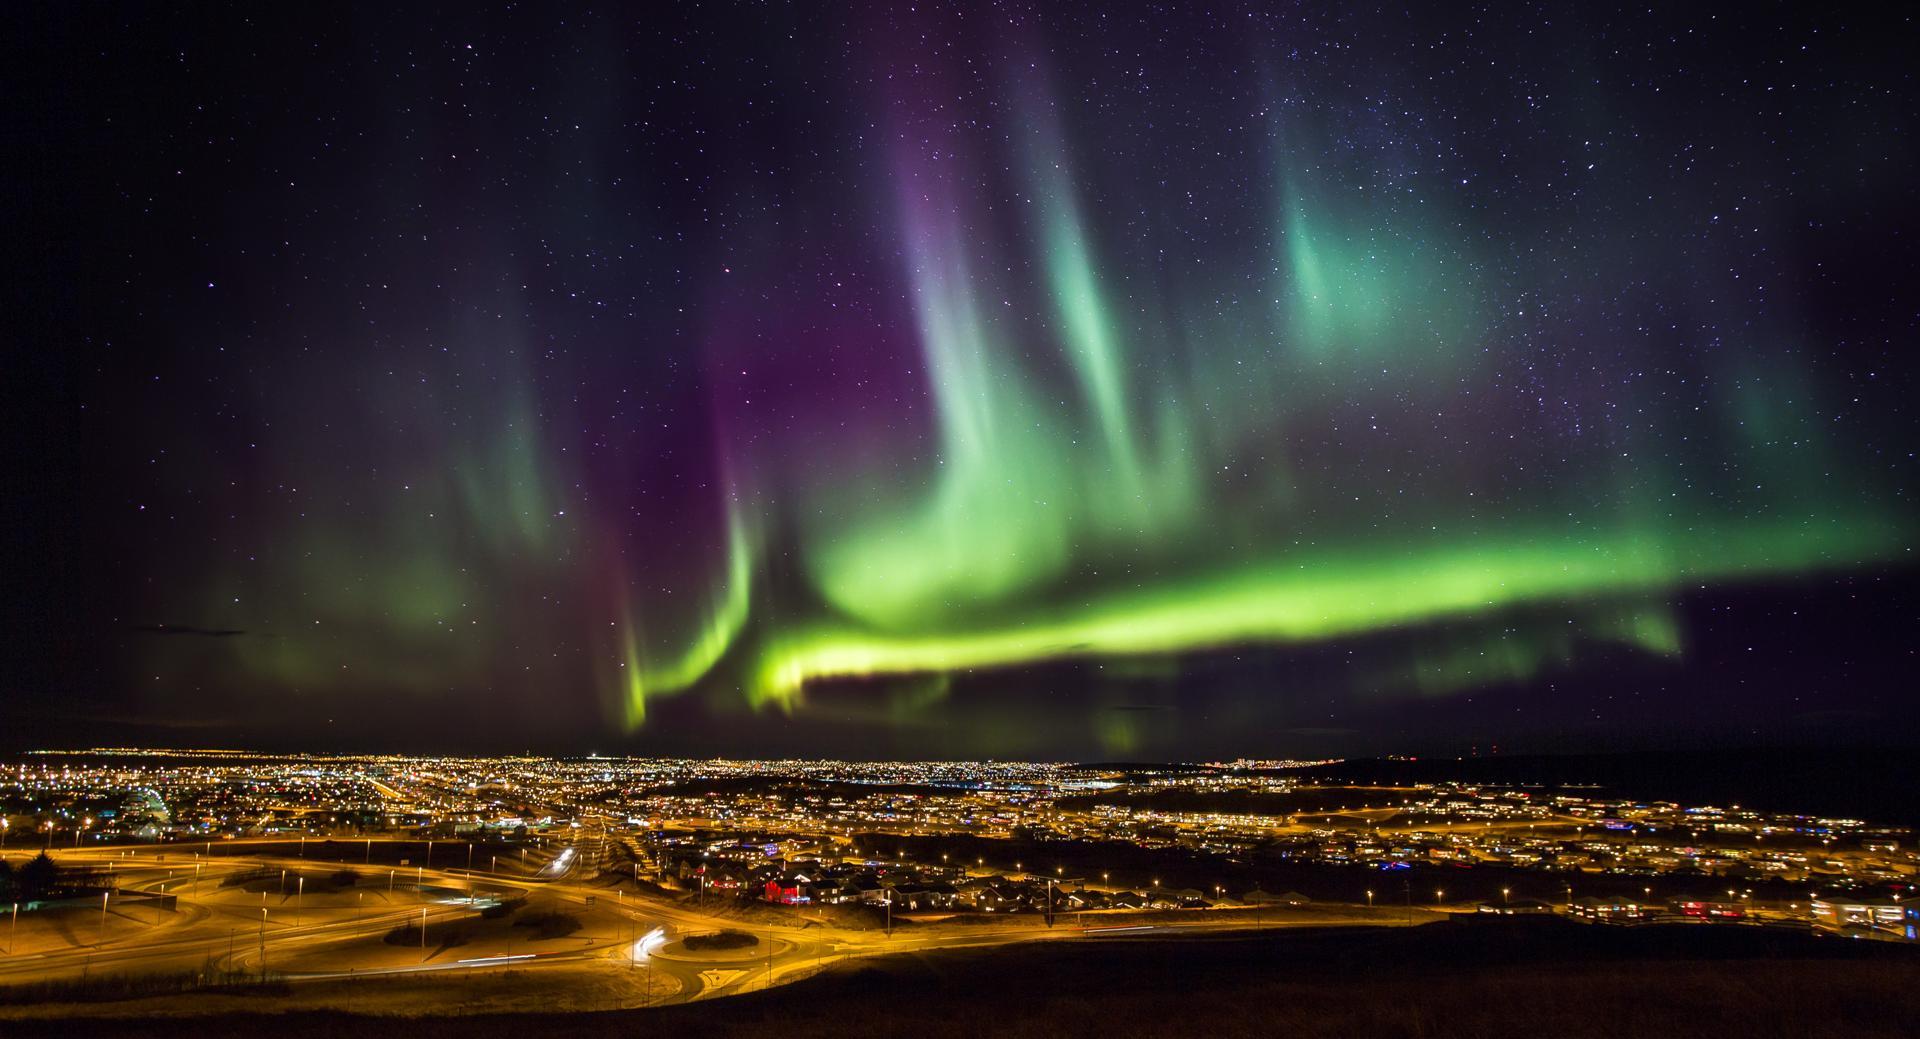 Zodiac Travel destination - Aquarius, Iceland